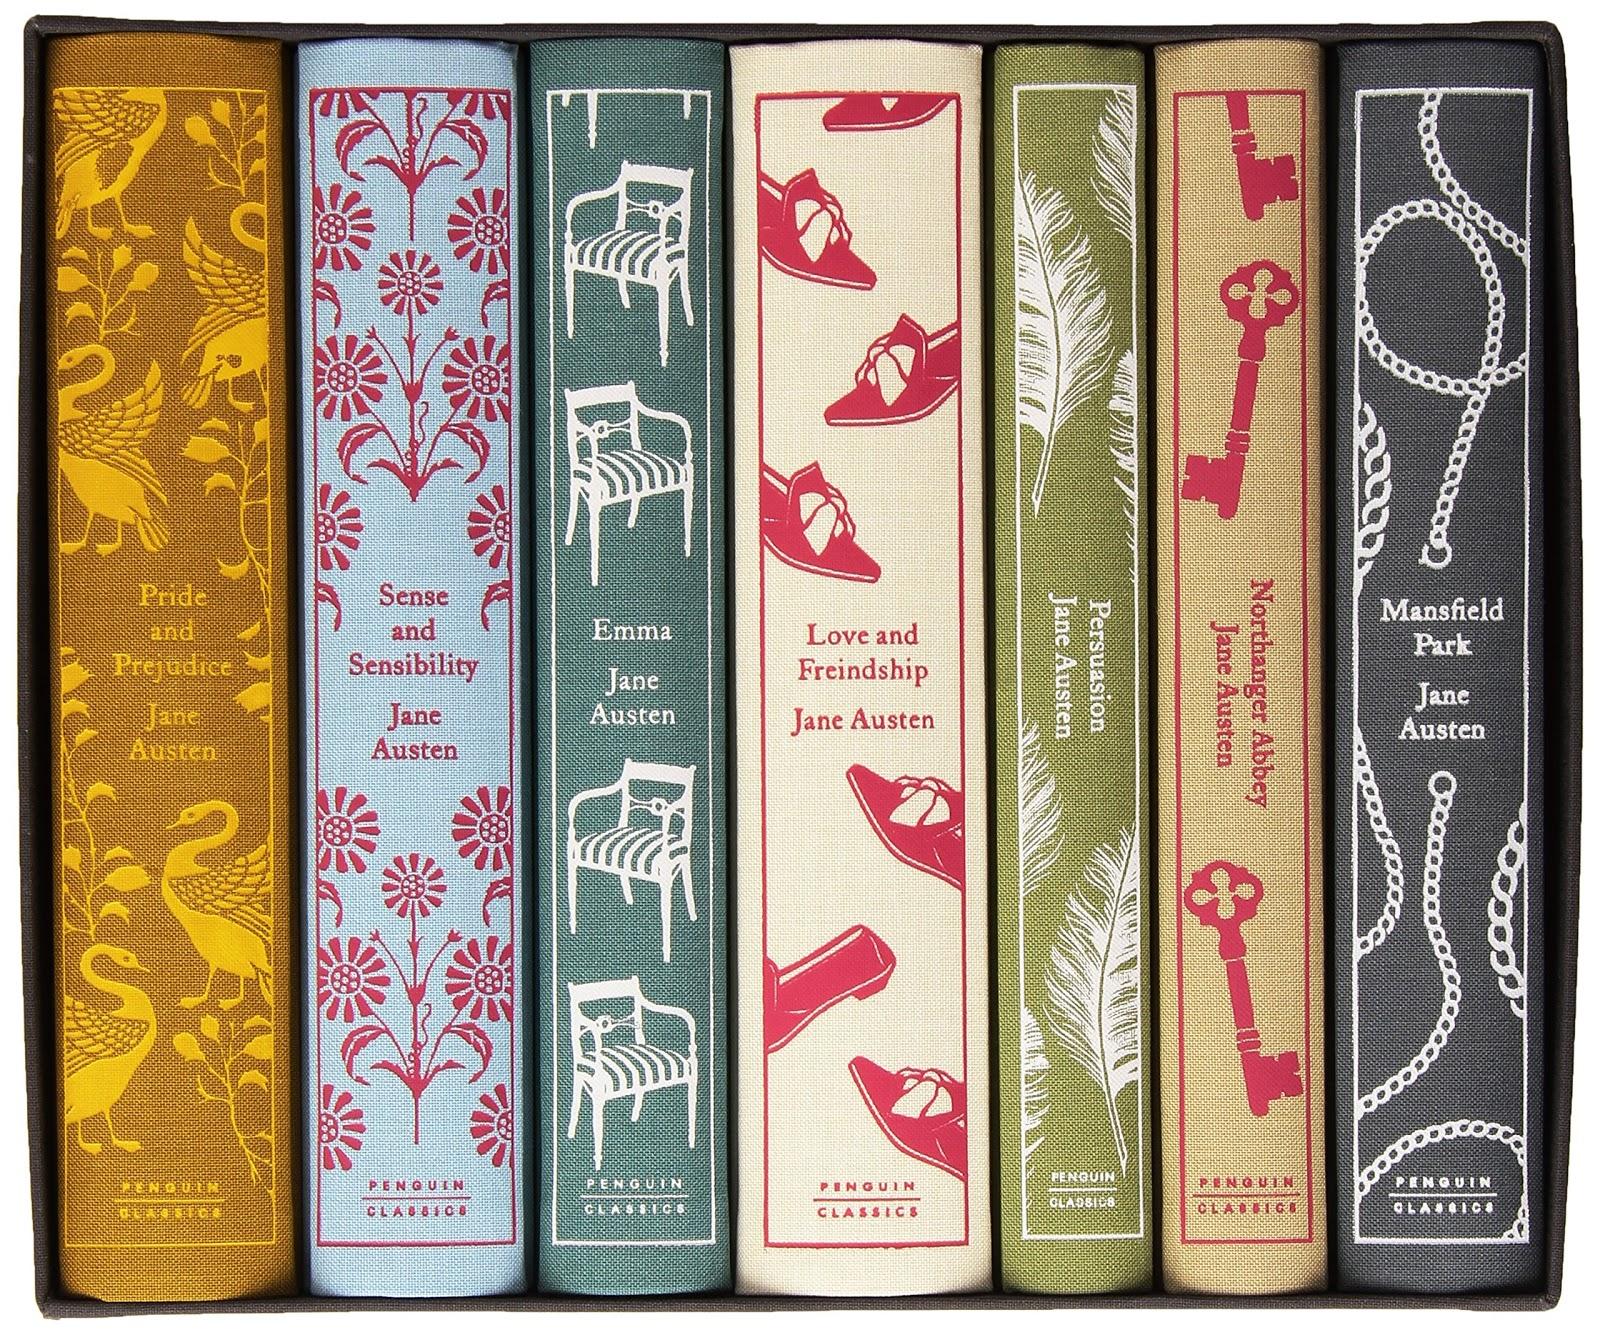 complete works of jane austen, hardcovers, minimal design